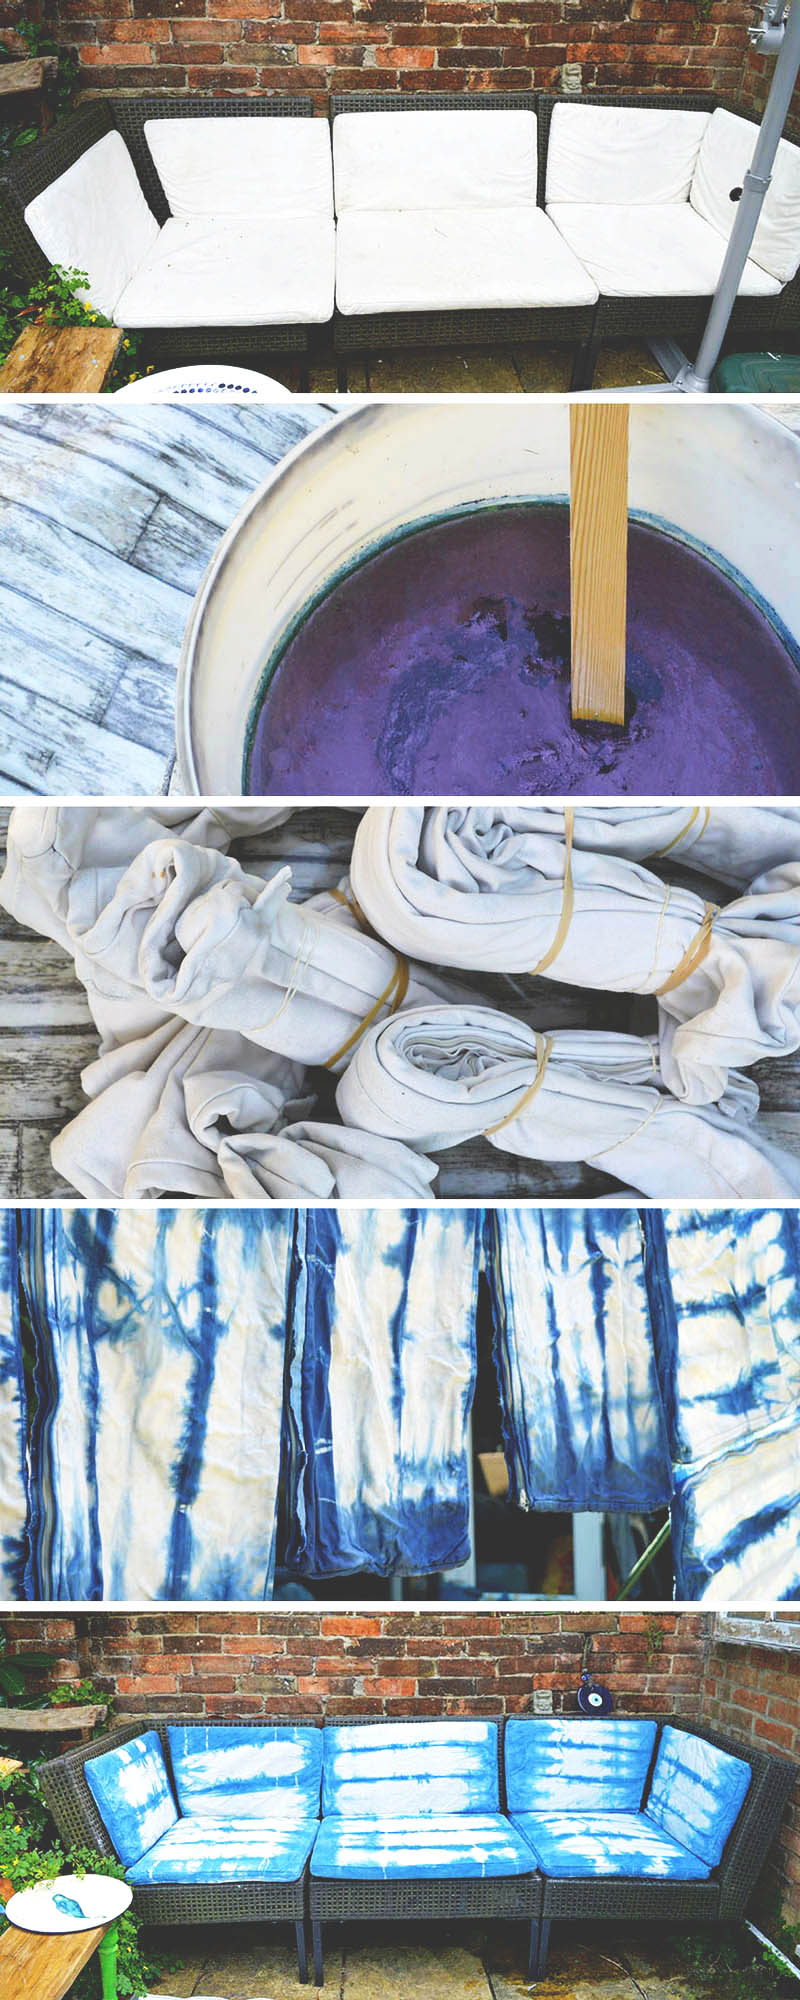 How to update an Ikea Ammero sofa with indigo shibori dyeing